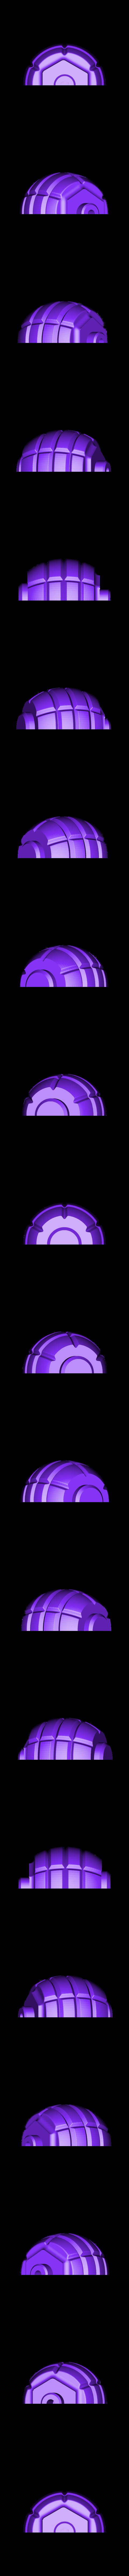 GRENADE_V4_SHELL_R.stl Download free STL file How it works (Training Grenade) • 3D print model, MuSSy